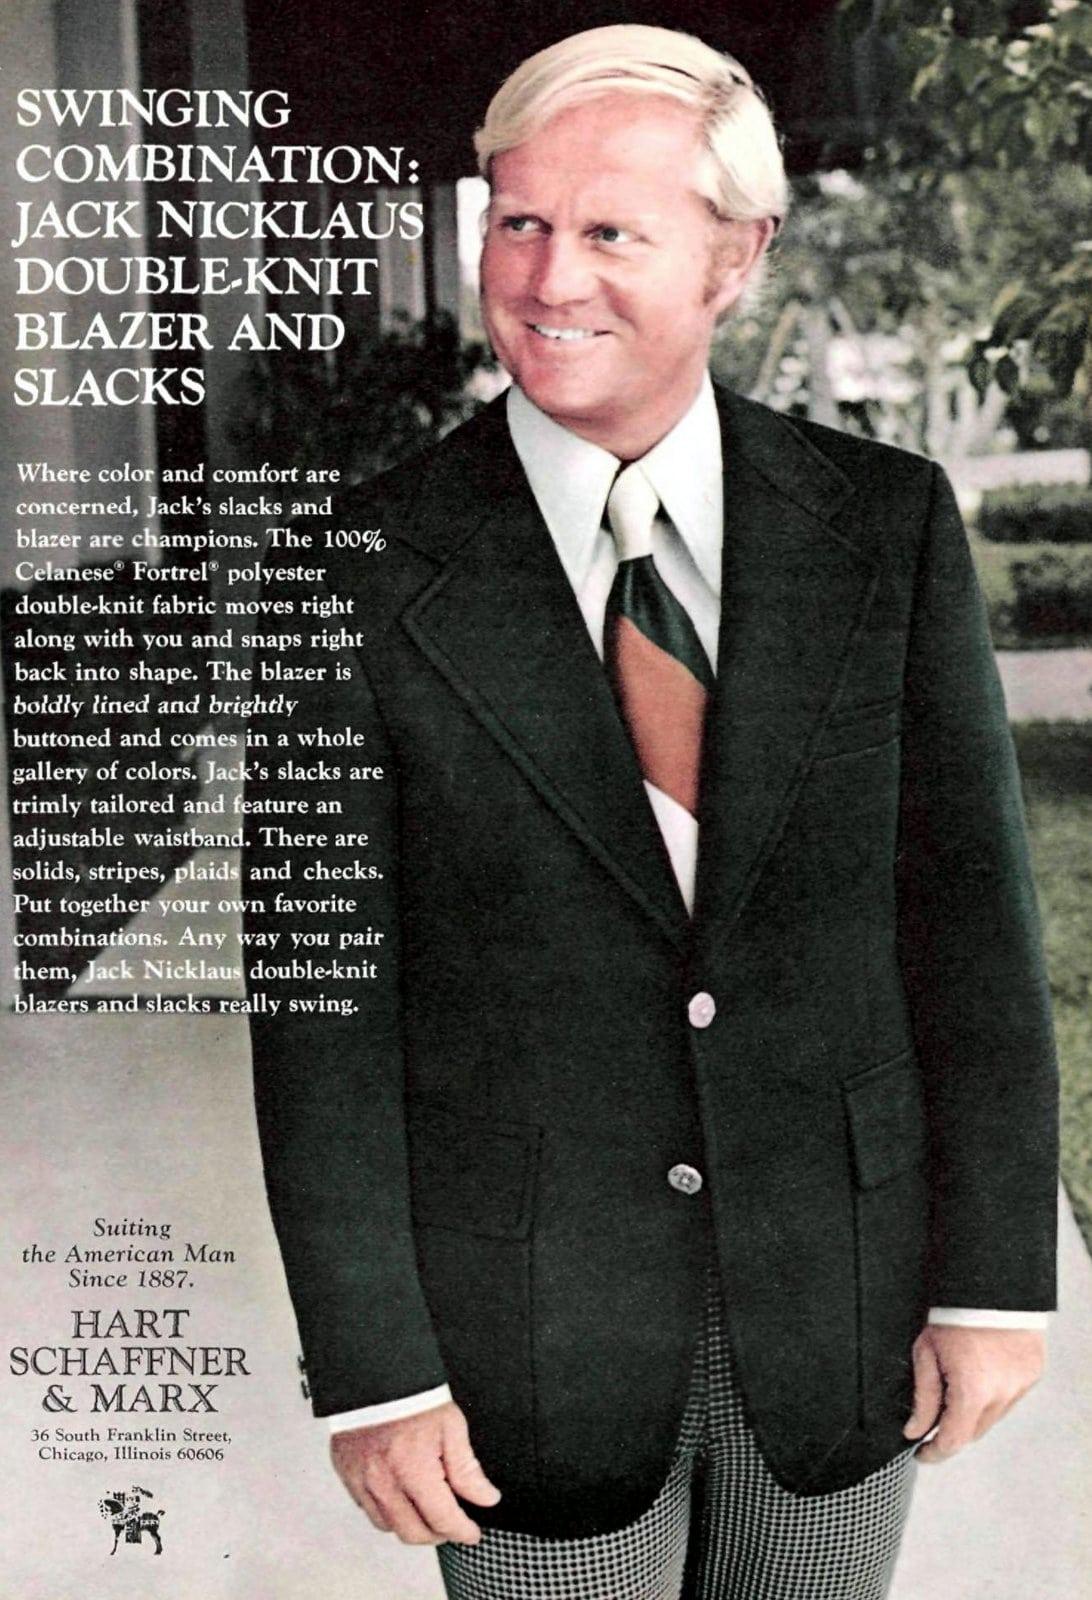 Golfer Jack Nicklaus double-knit blazer and slacks (1973)